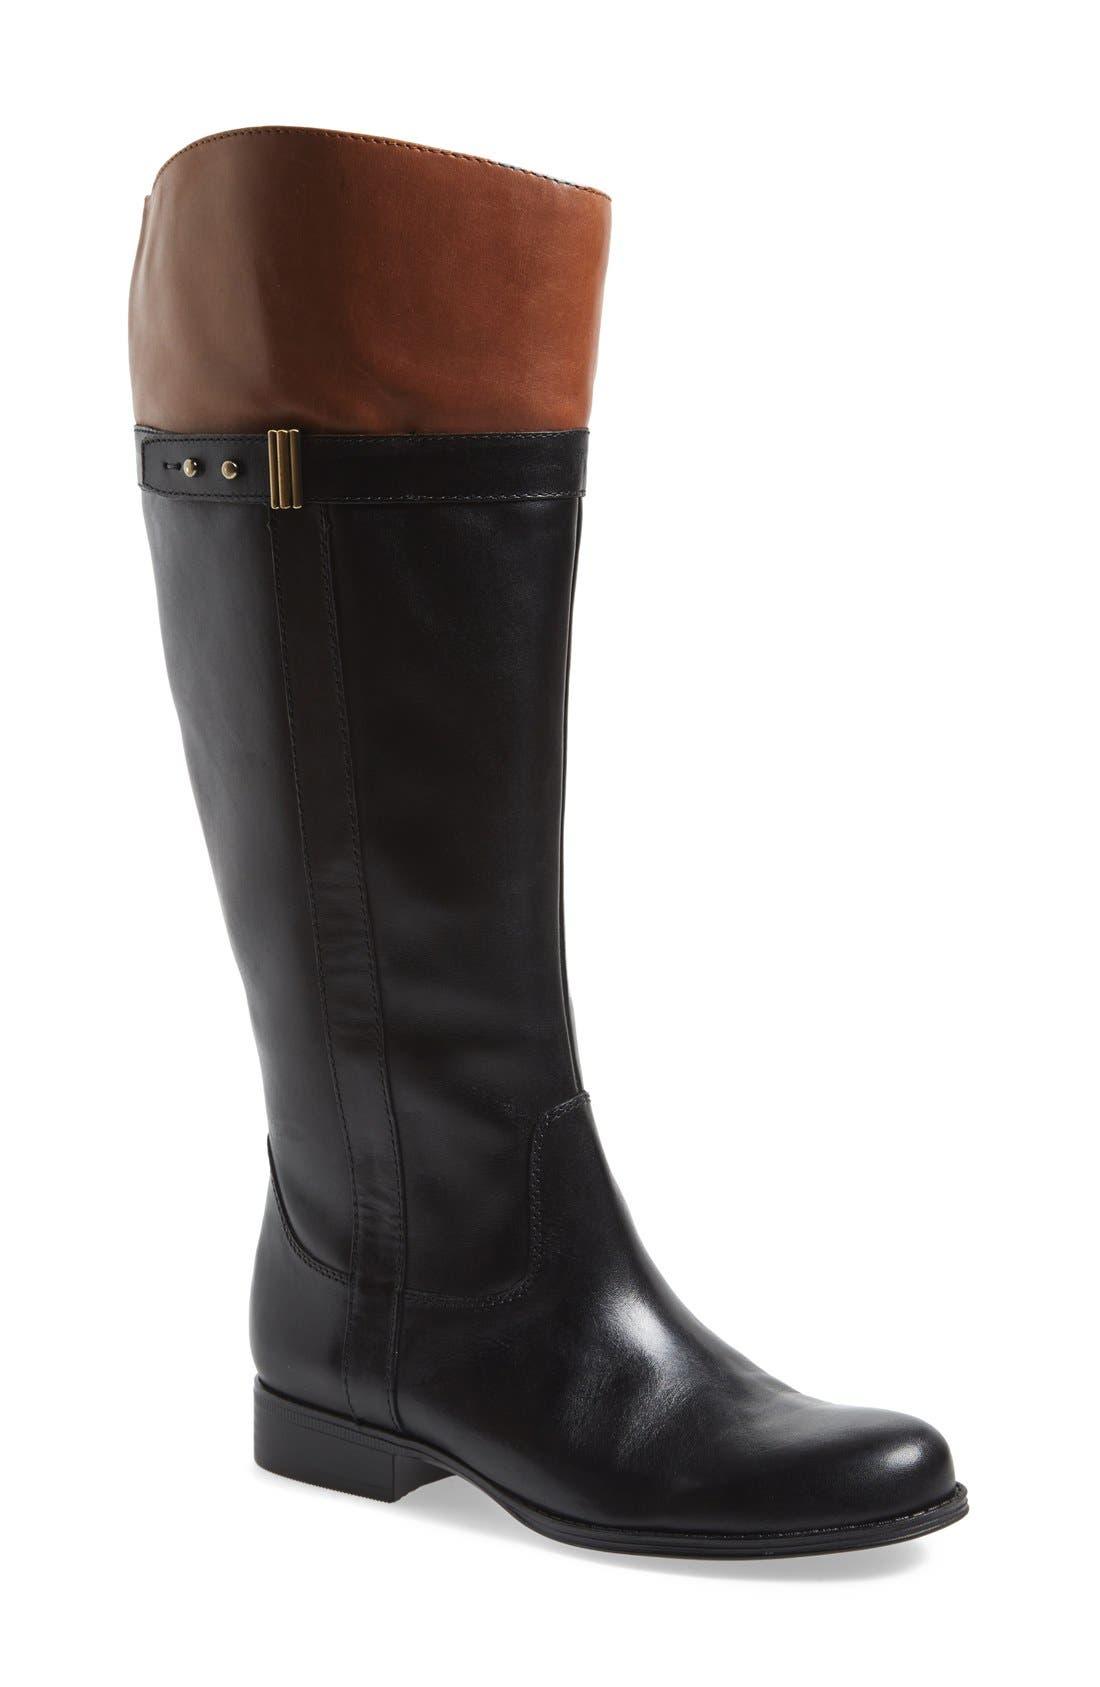 Main Image - Naturalizer 'Josette' Knee High Boot (Women)